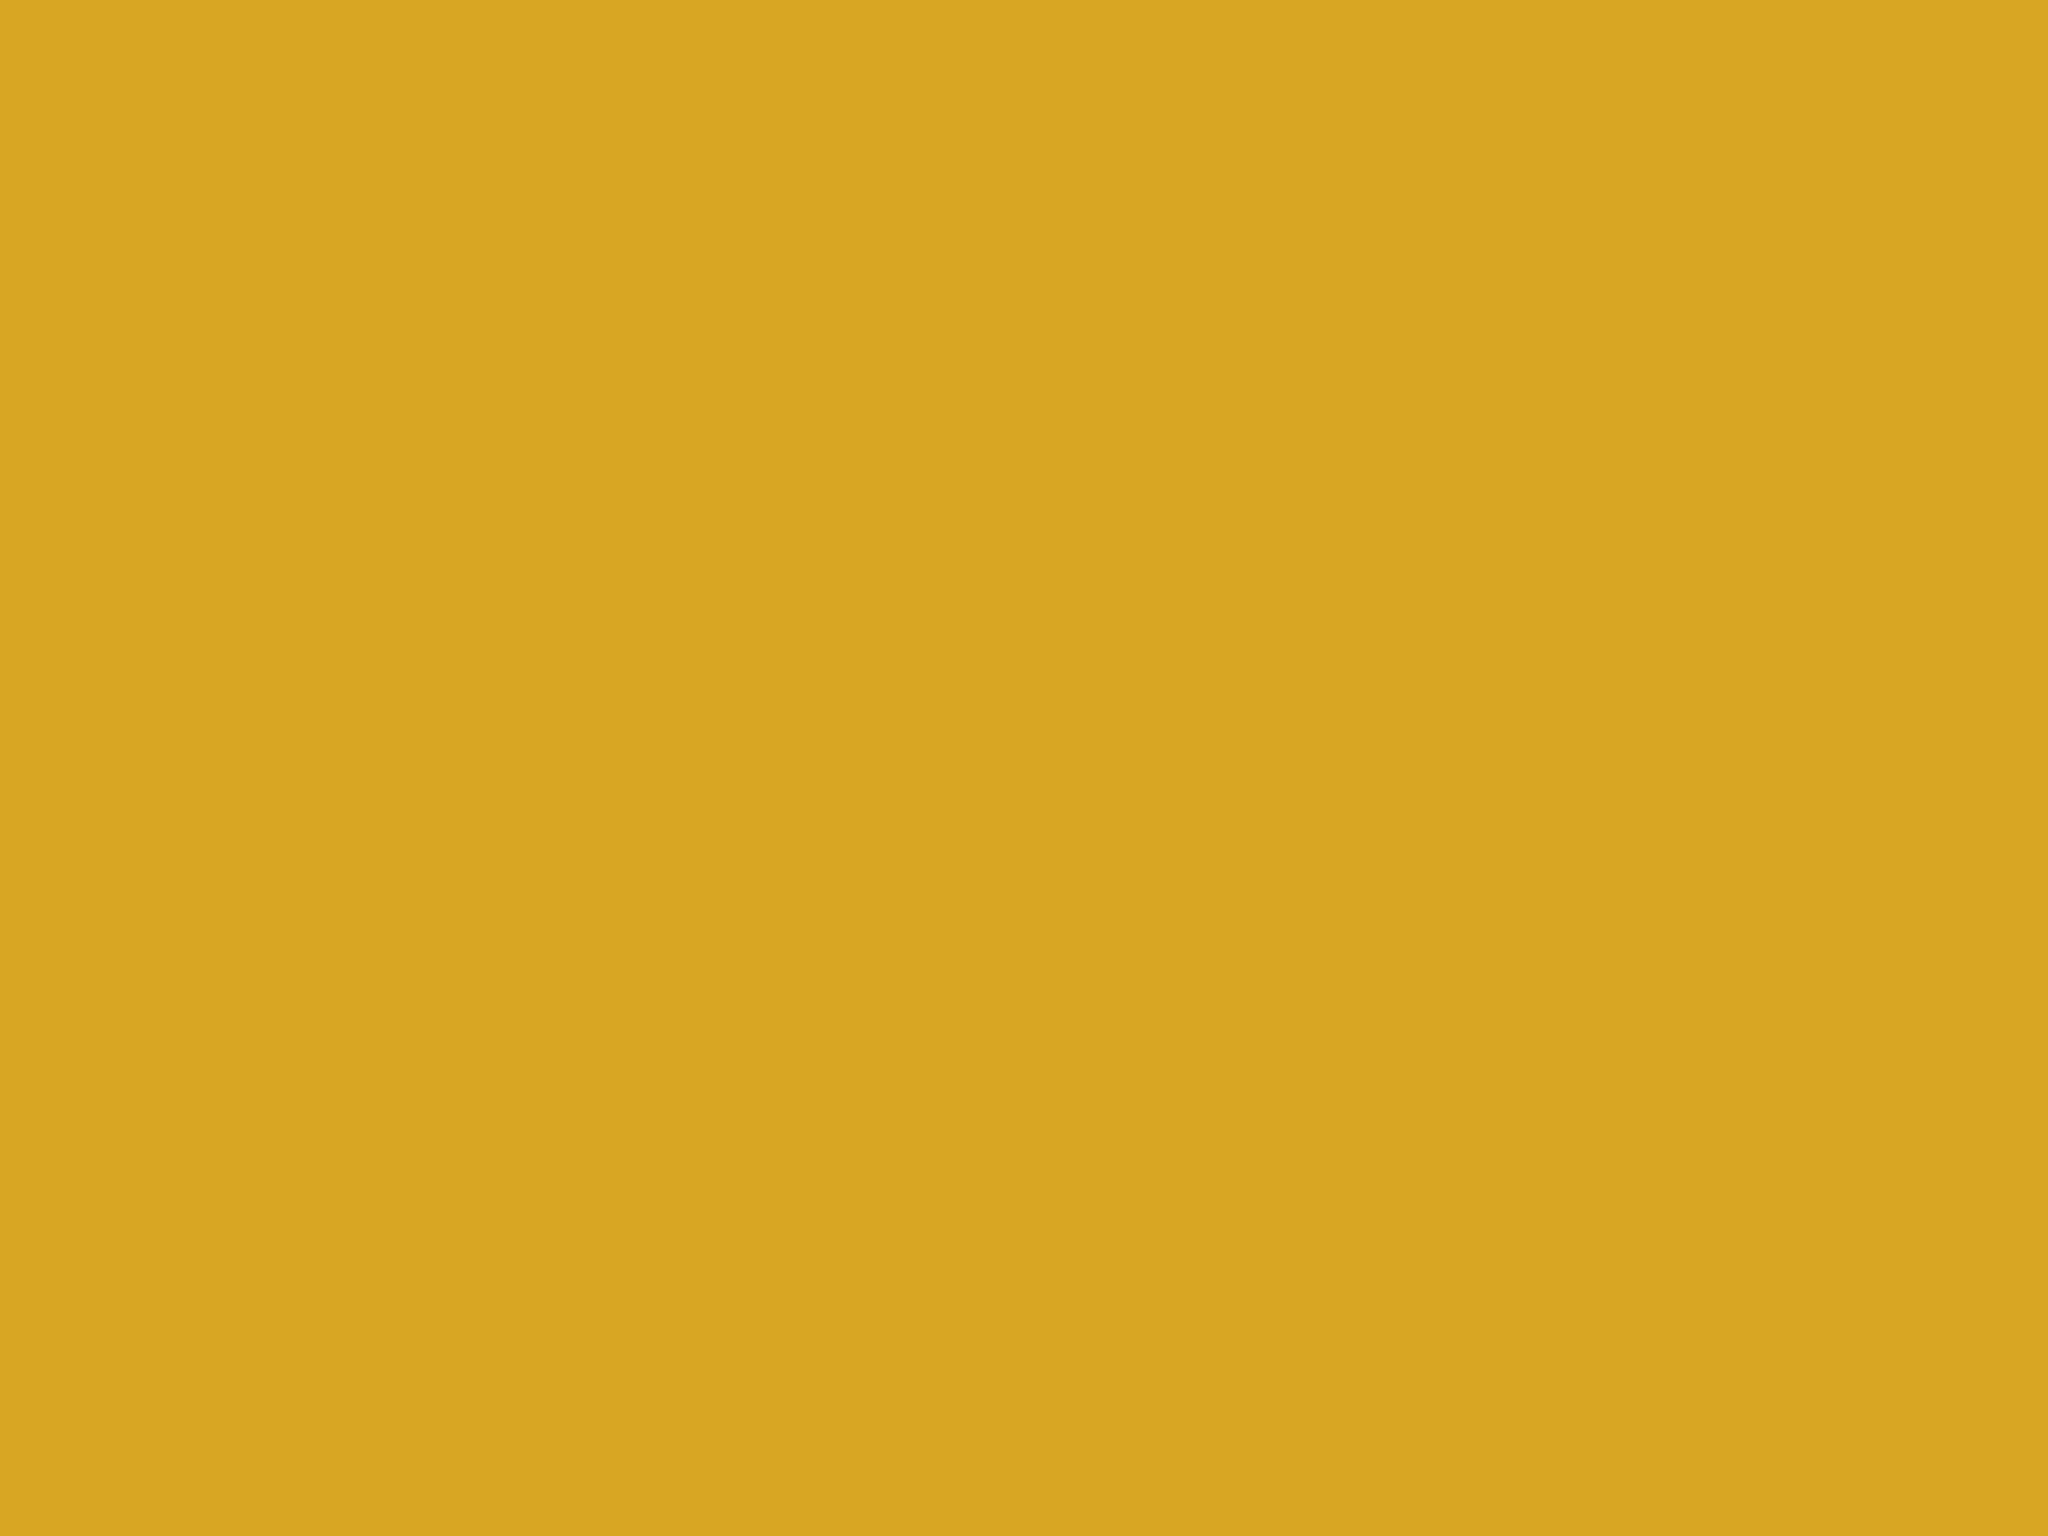 2048x1536 Goldenrod Solid Color Background